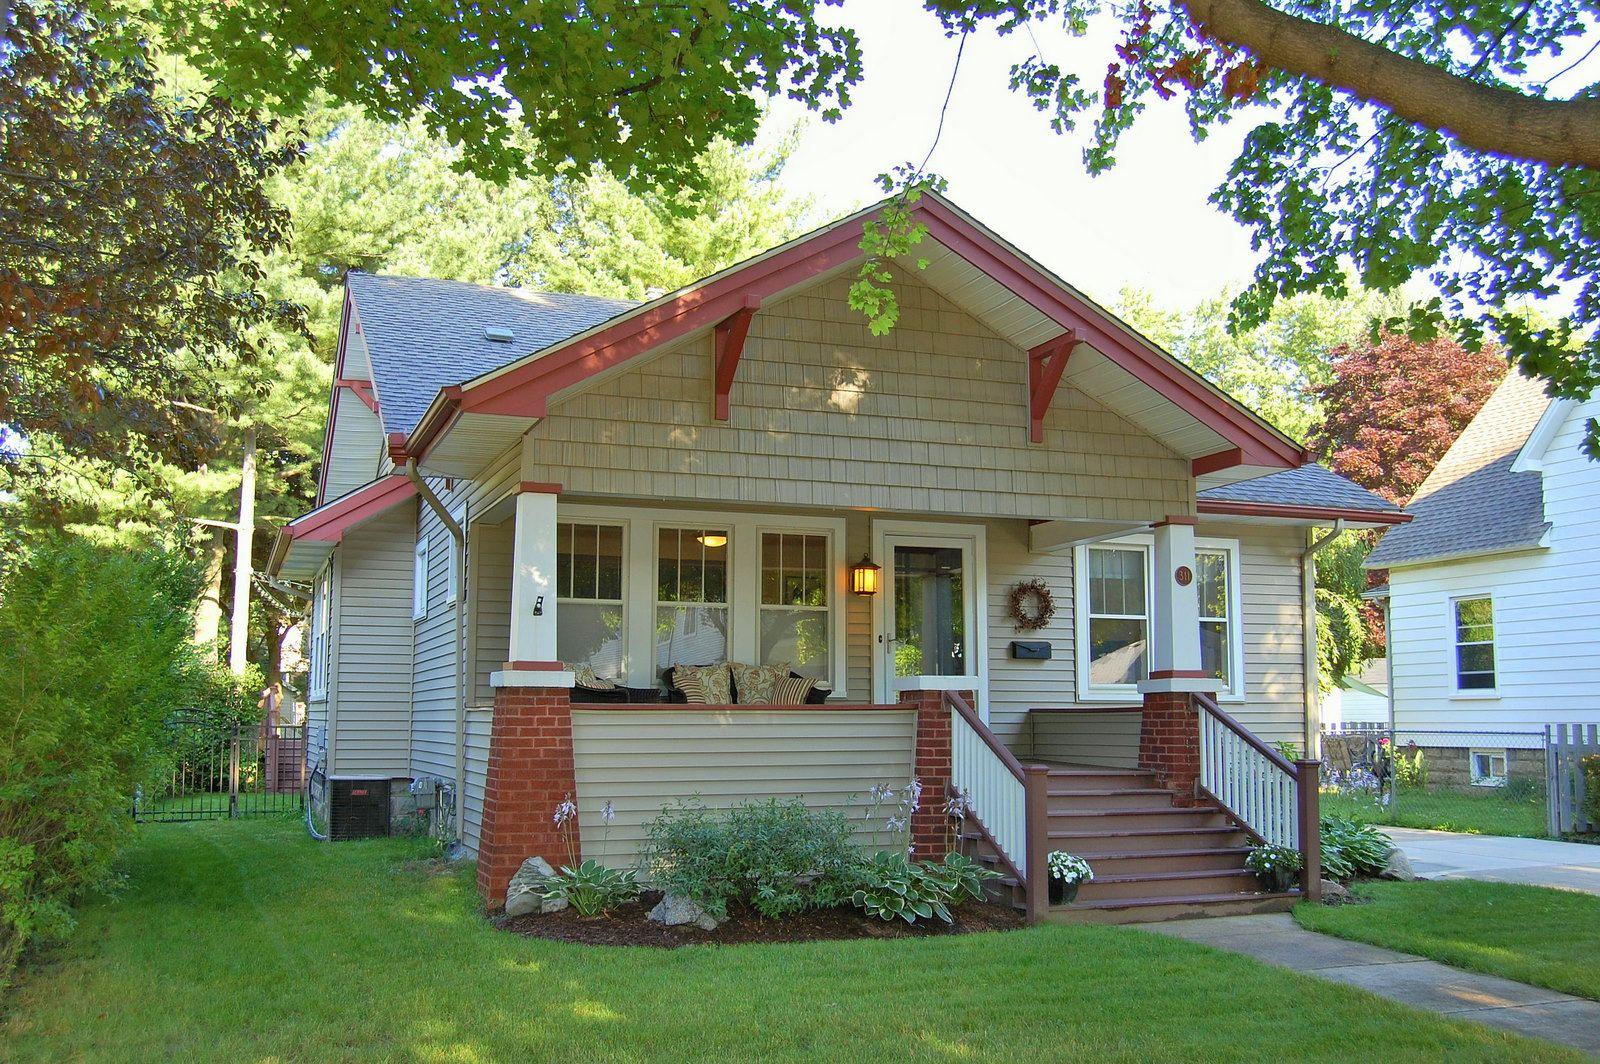 Architecture Thread Craftsman Style Bungalow Craftsman Bungalows Craftsman House